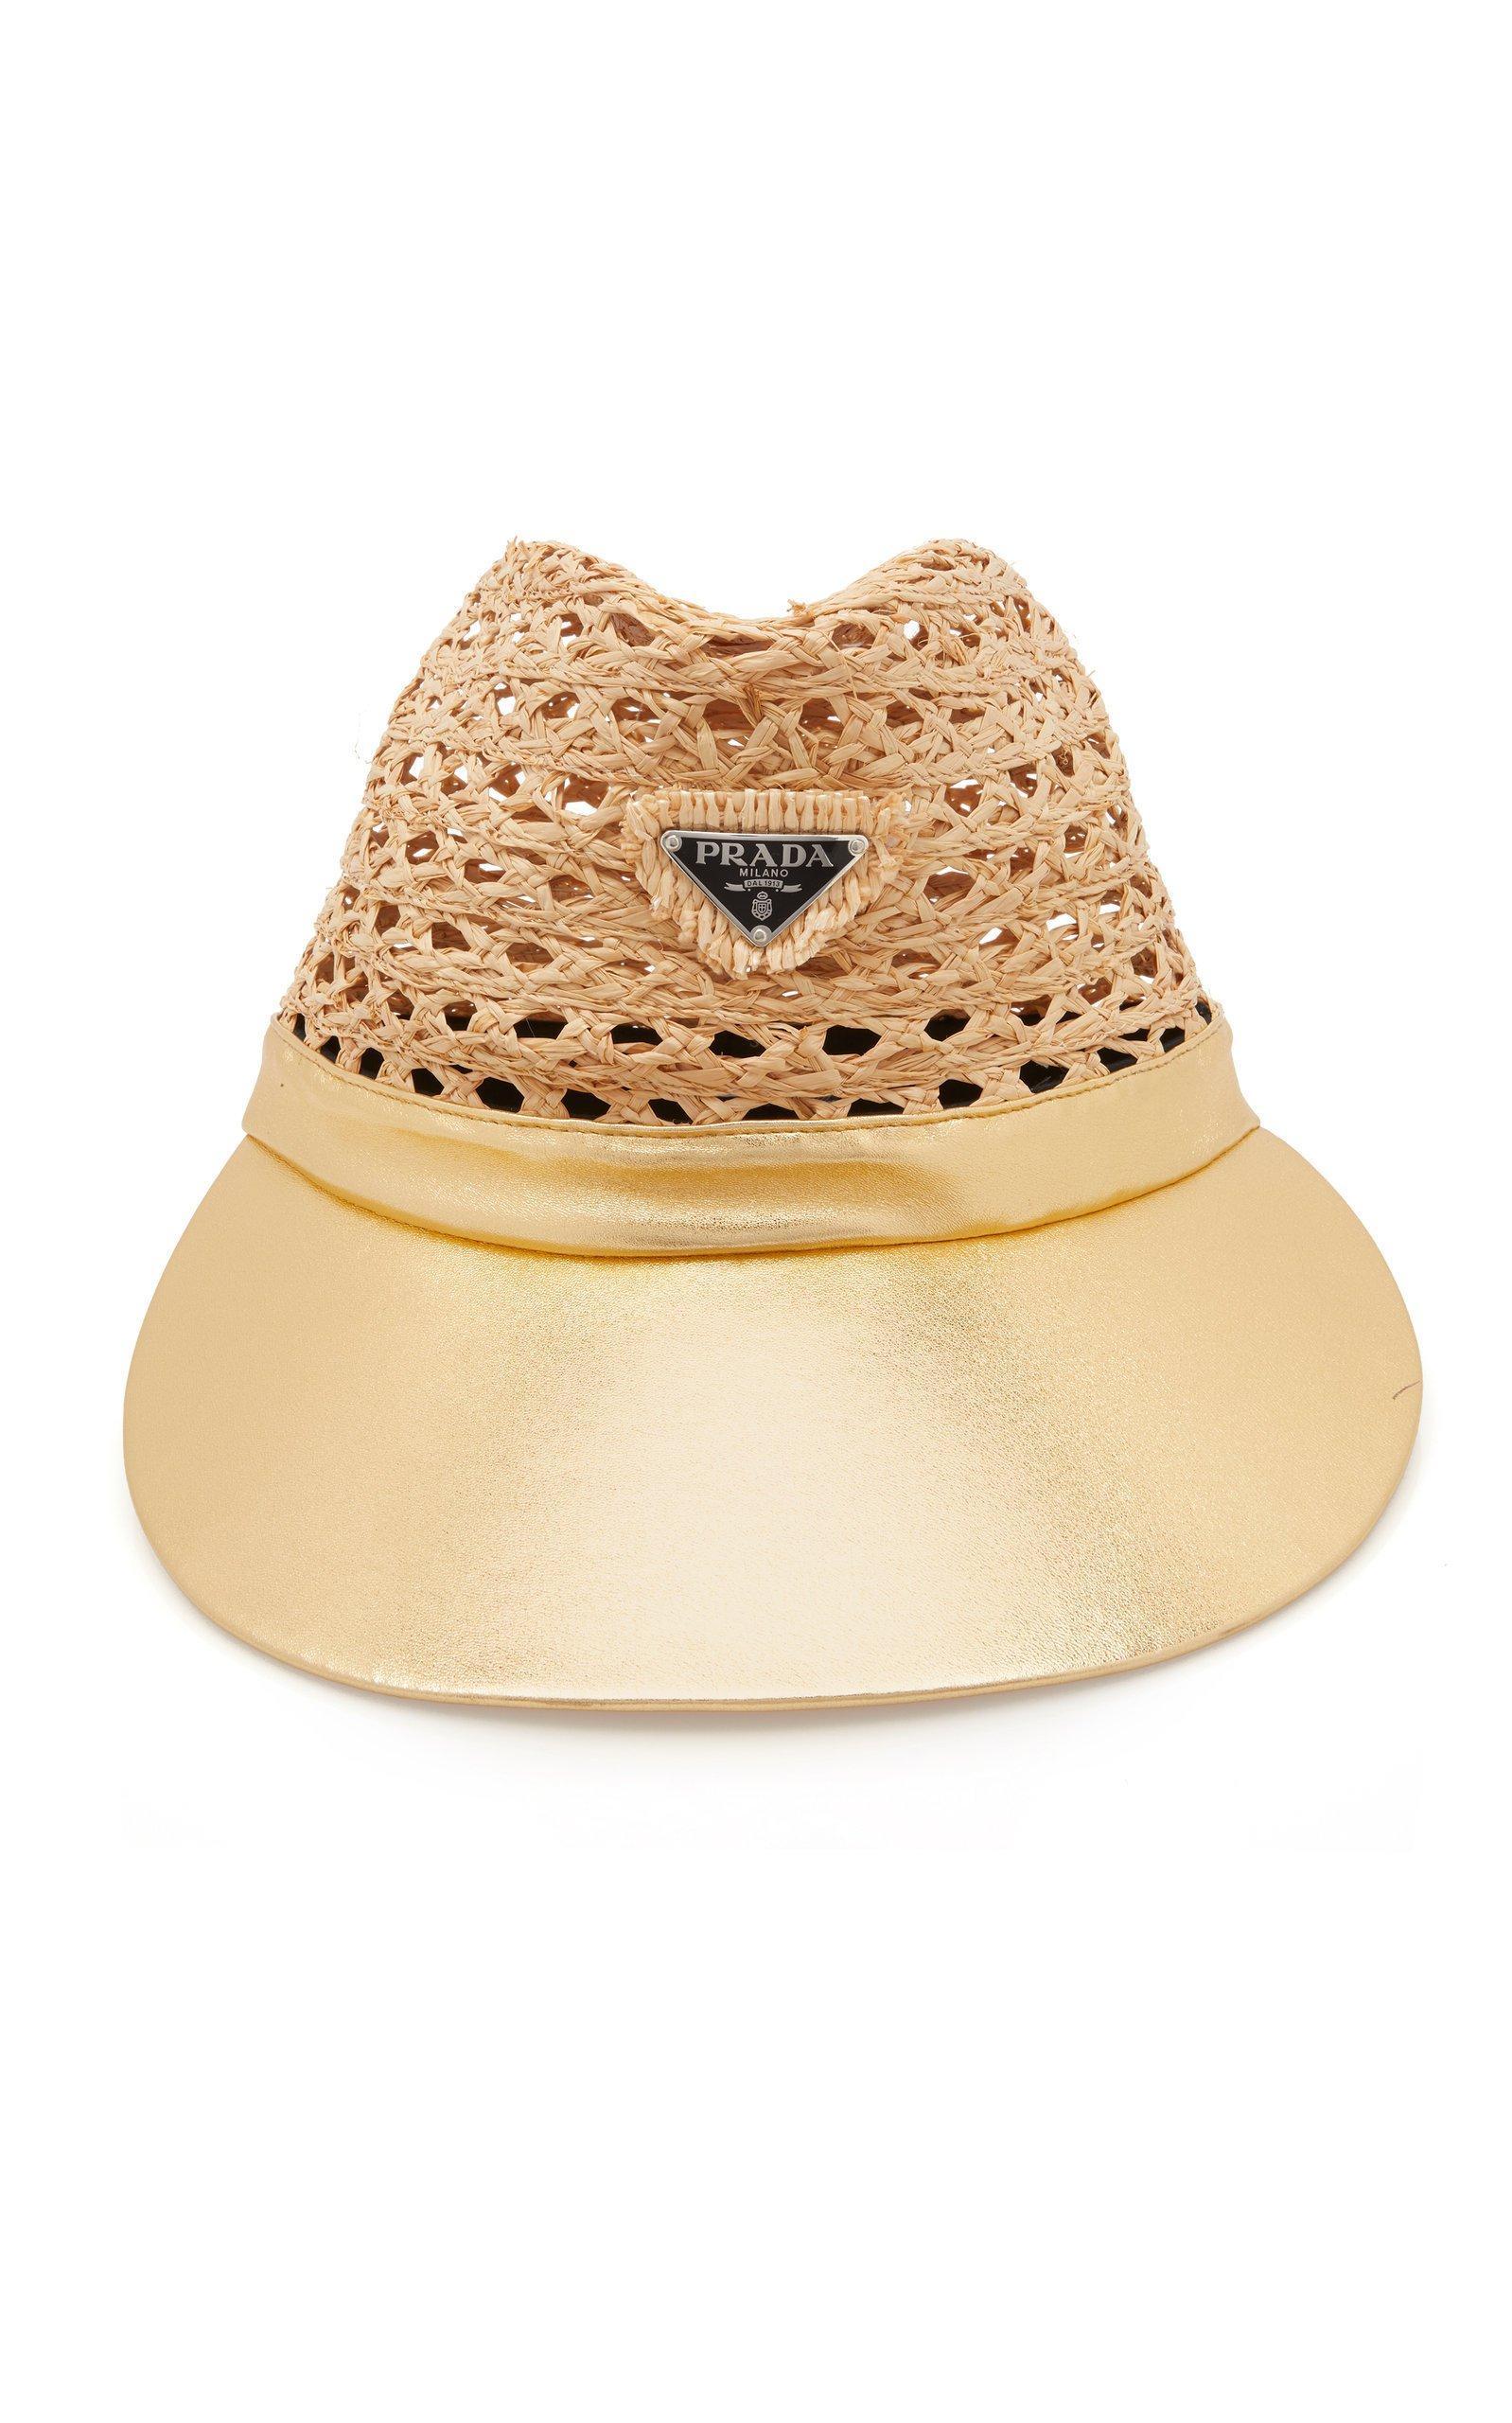 Prada Triangolo Raffia Hat Size: M